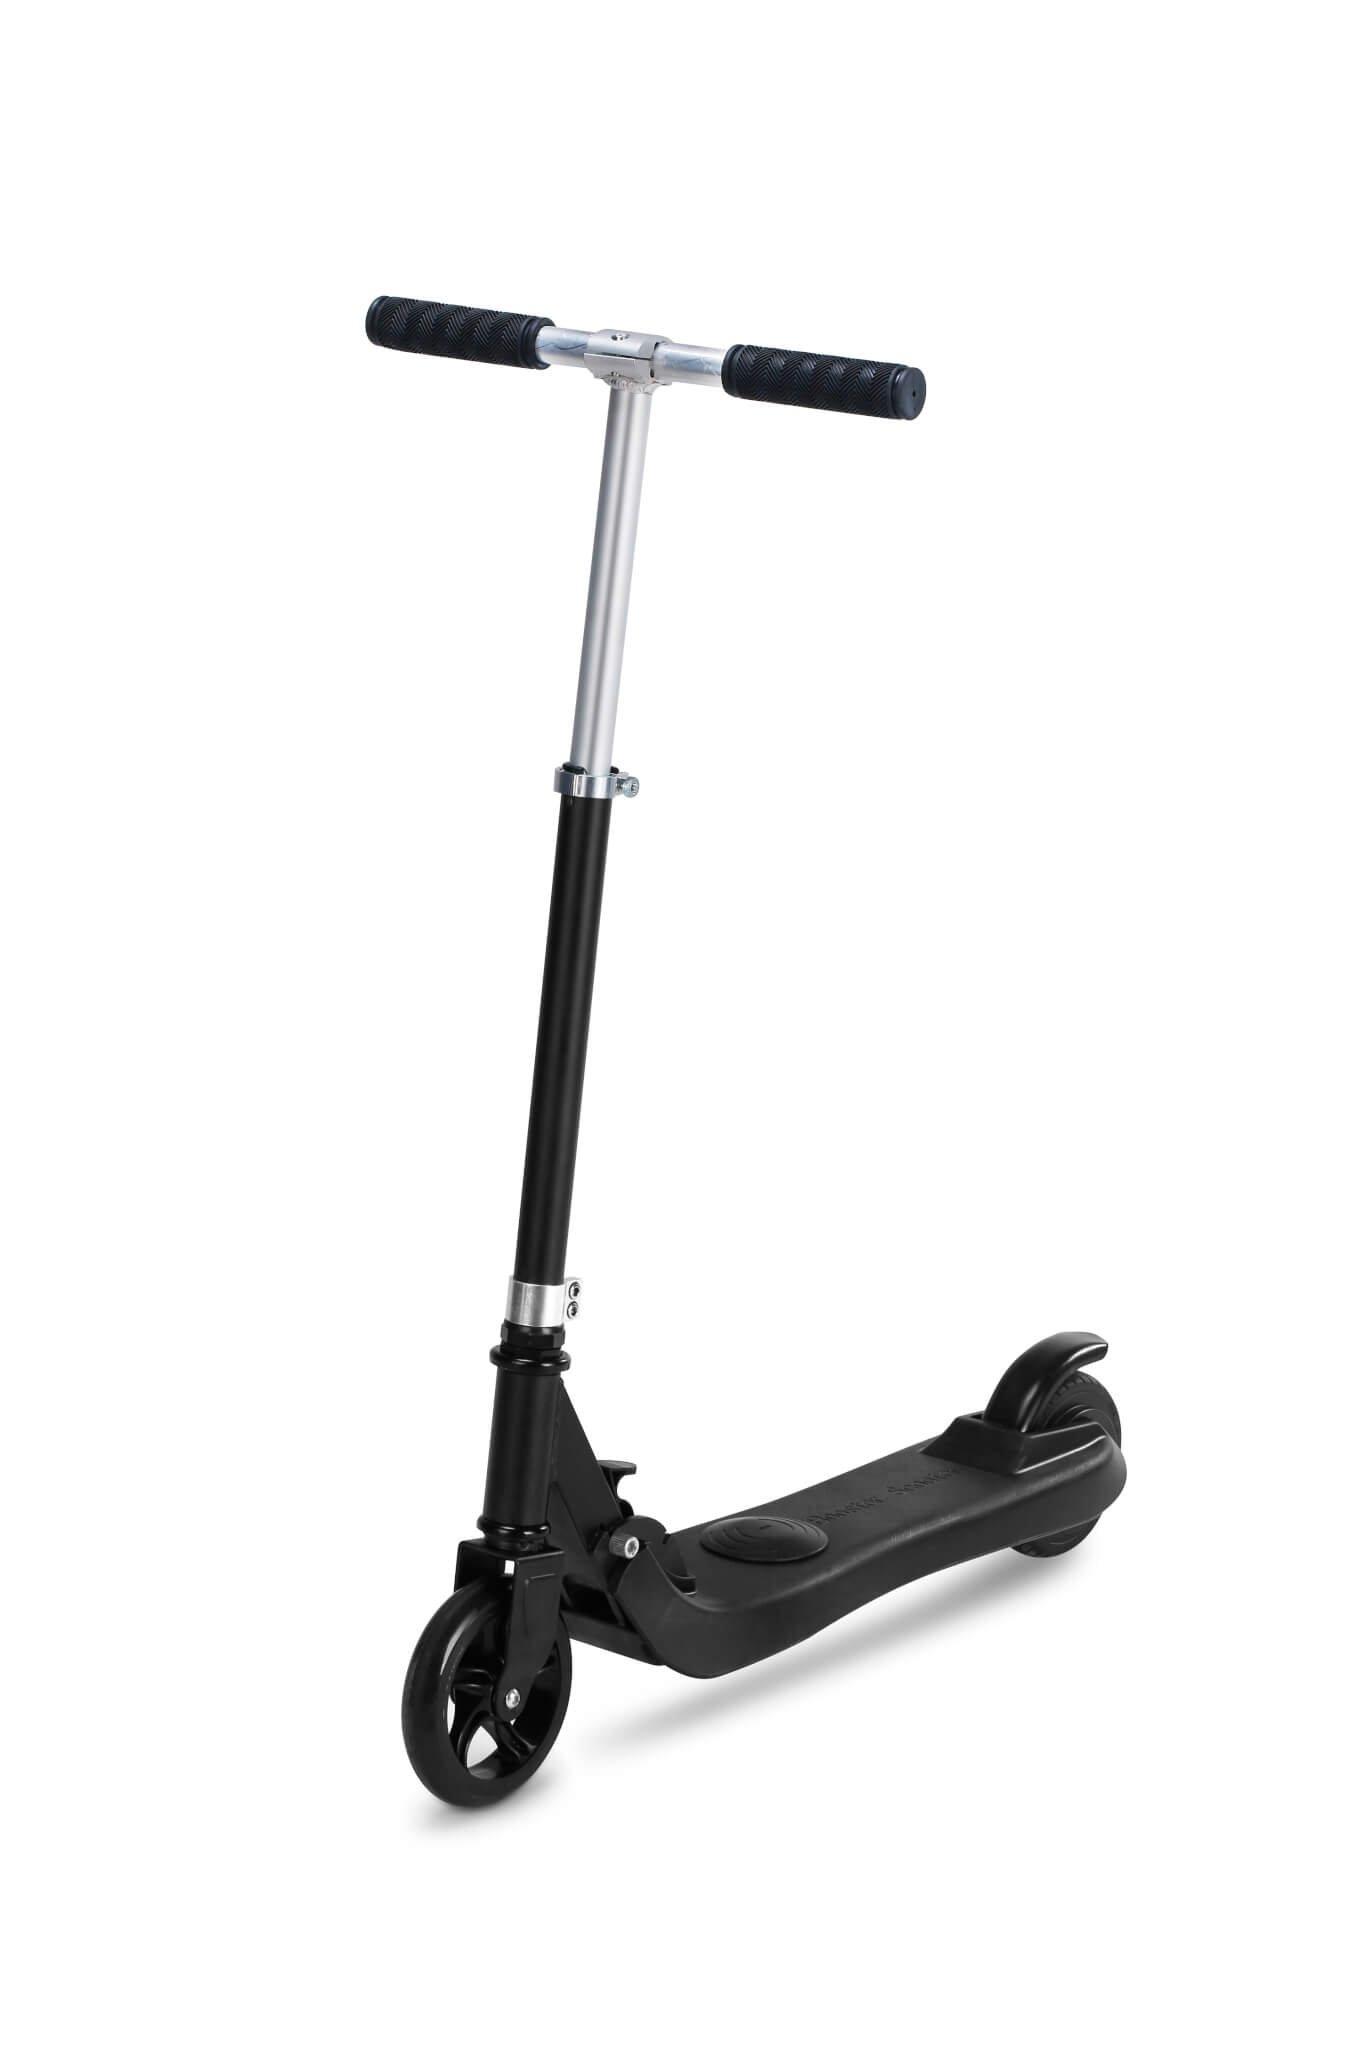 iconBIT IK-1903K - Klassischer Roller - 6 km/h - 50 kg - Schwarz - Feste Räder - 14 cm